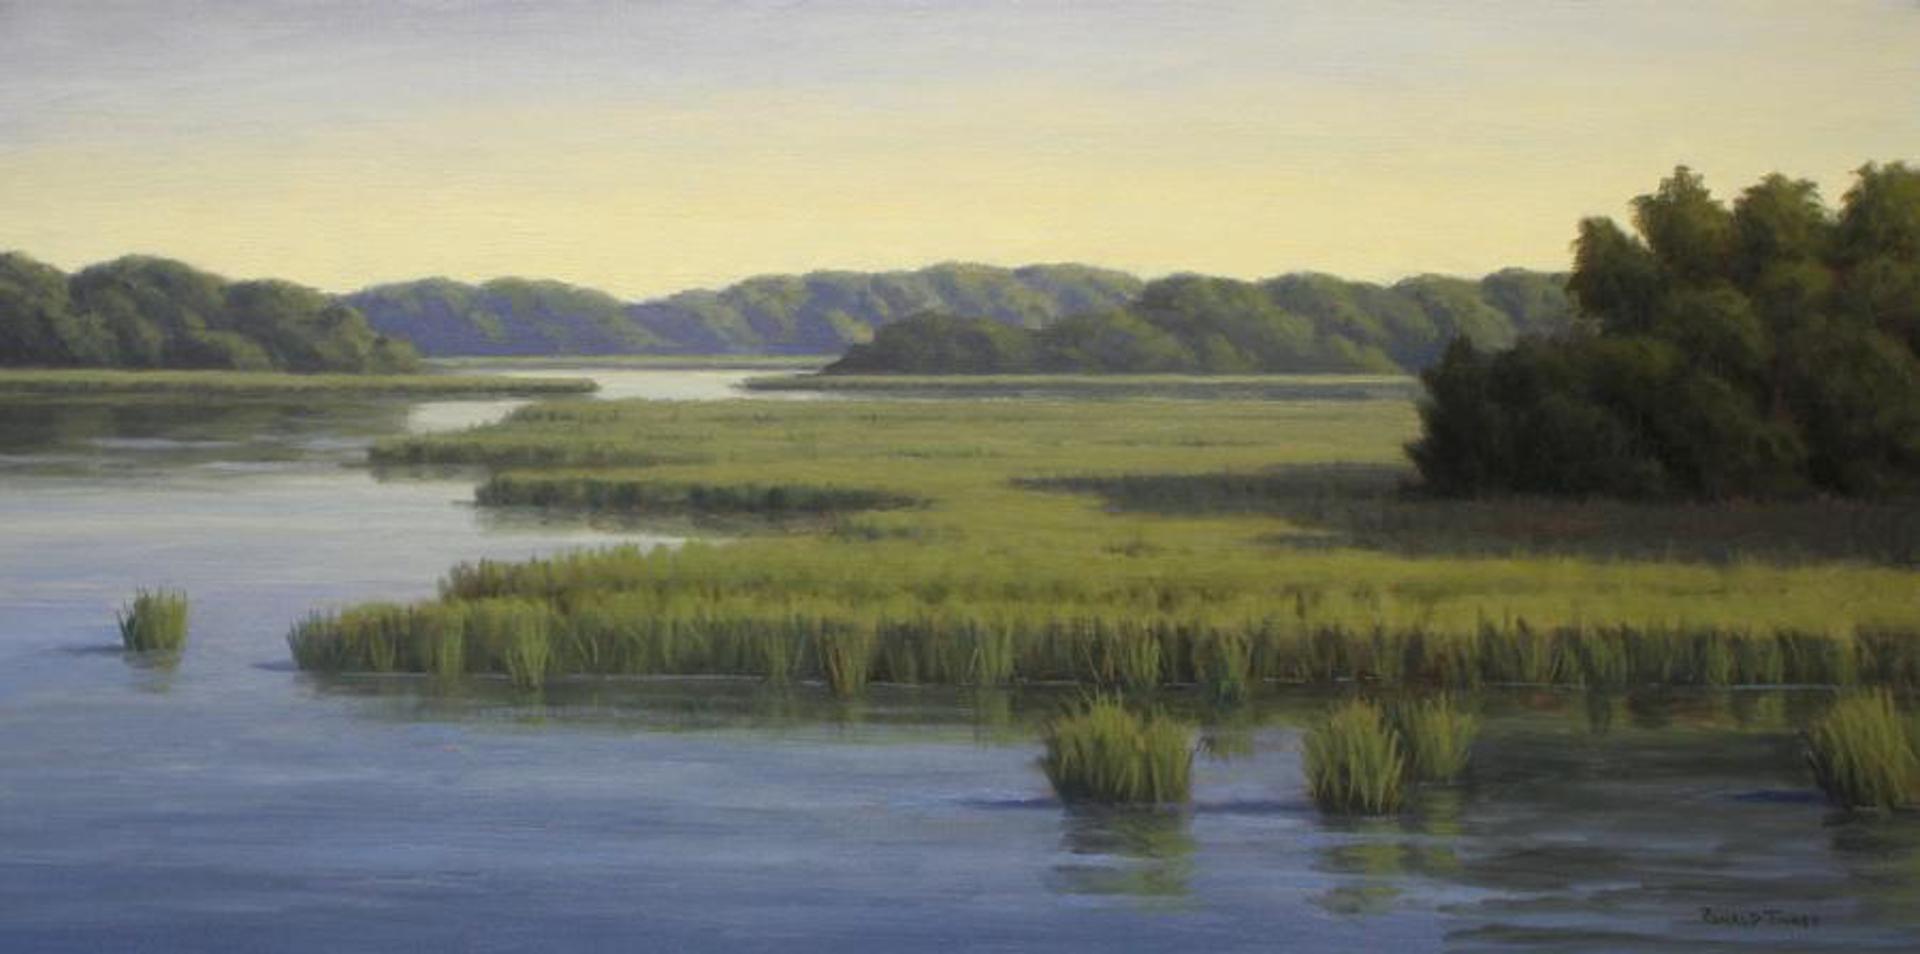 Calm Beauty by Ronald Tinney